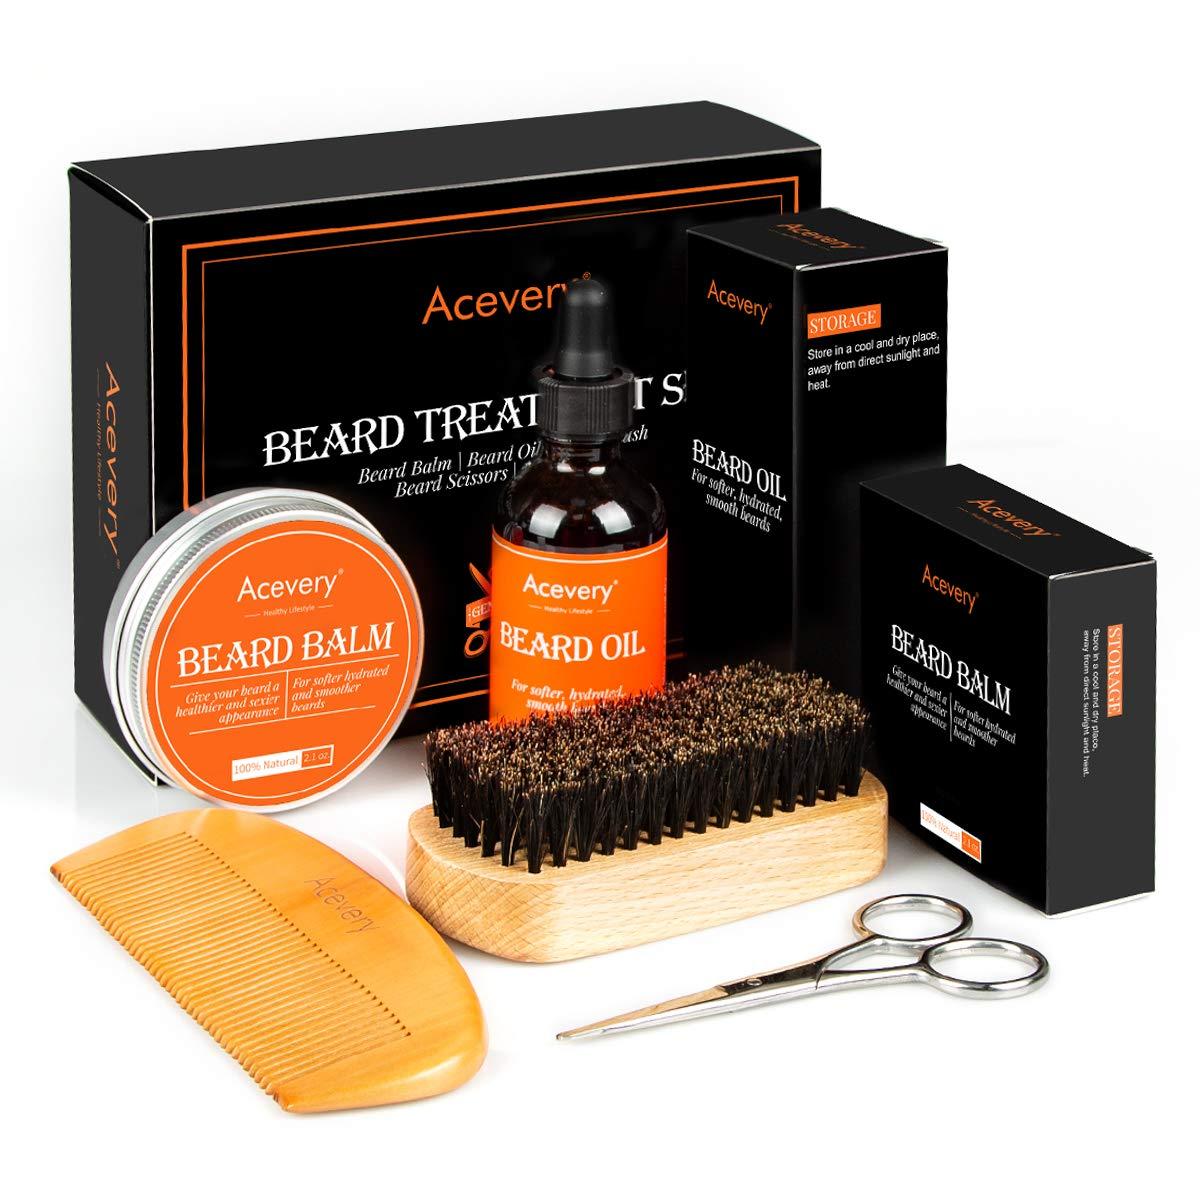 Beard Grooming & Trimming Kit, Acevery Beard Care Treatment Gift Set for Men- 100 percent Natural Unscented Beard Oil, Beard Brush, Beard Comb, Mustache & Beard Balm, Beard Scissor CHUOTAI